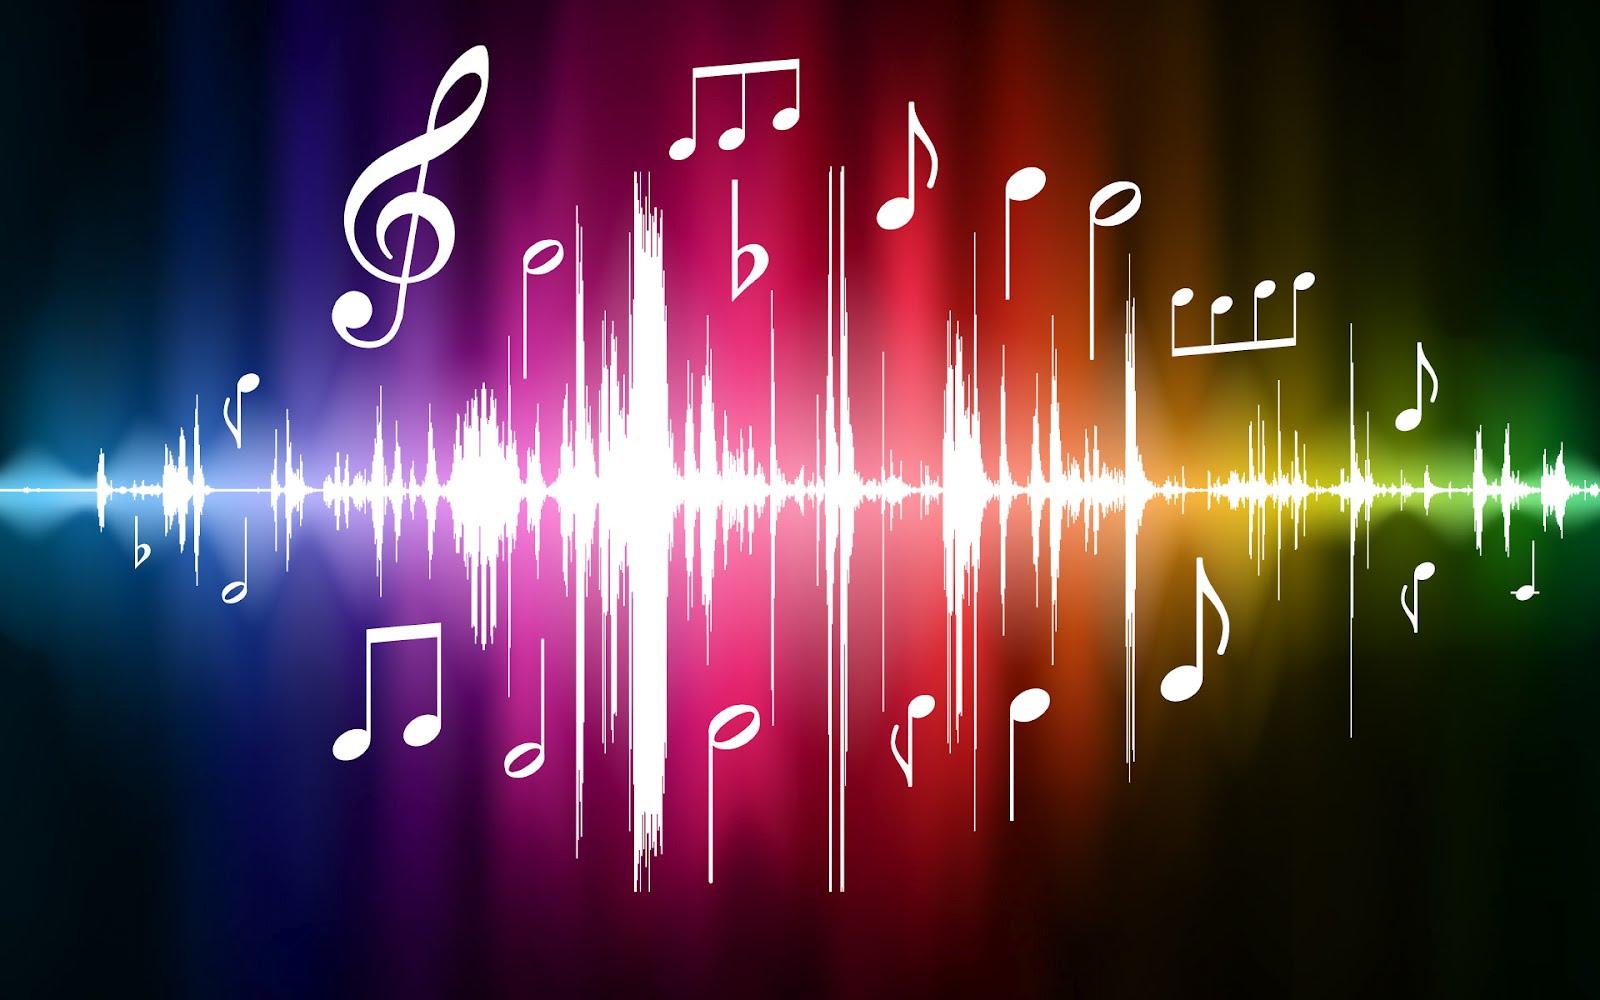 müzikli arka plan resimleri twitter arka planlar müzikli arka ...